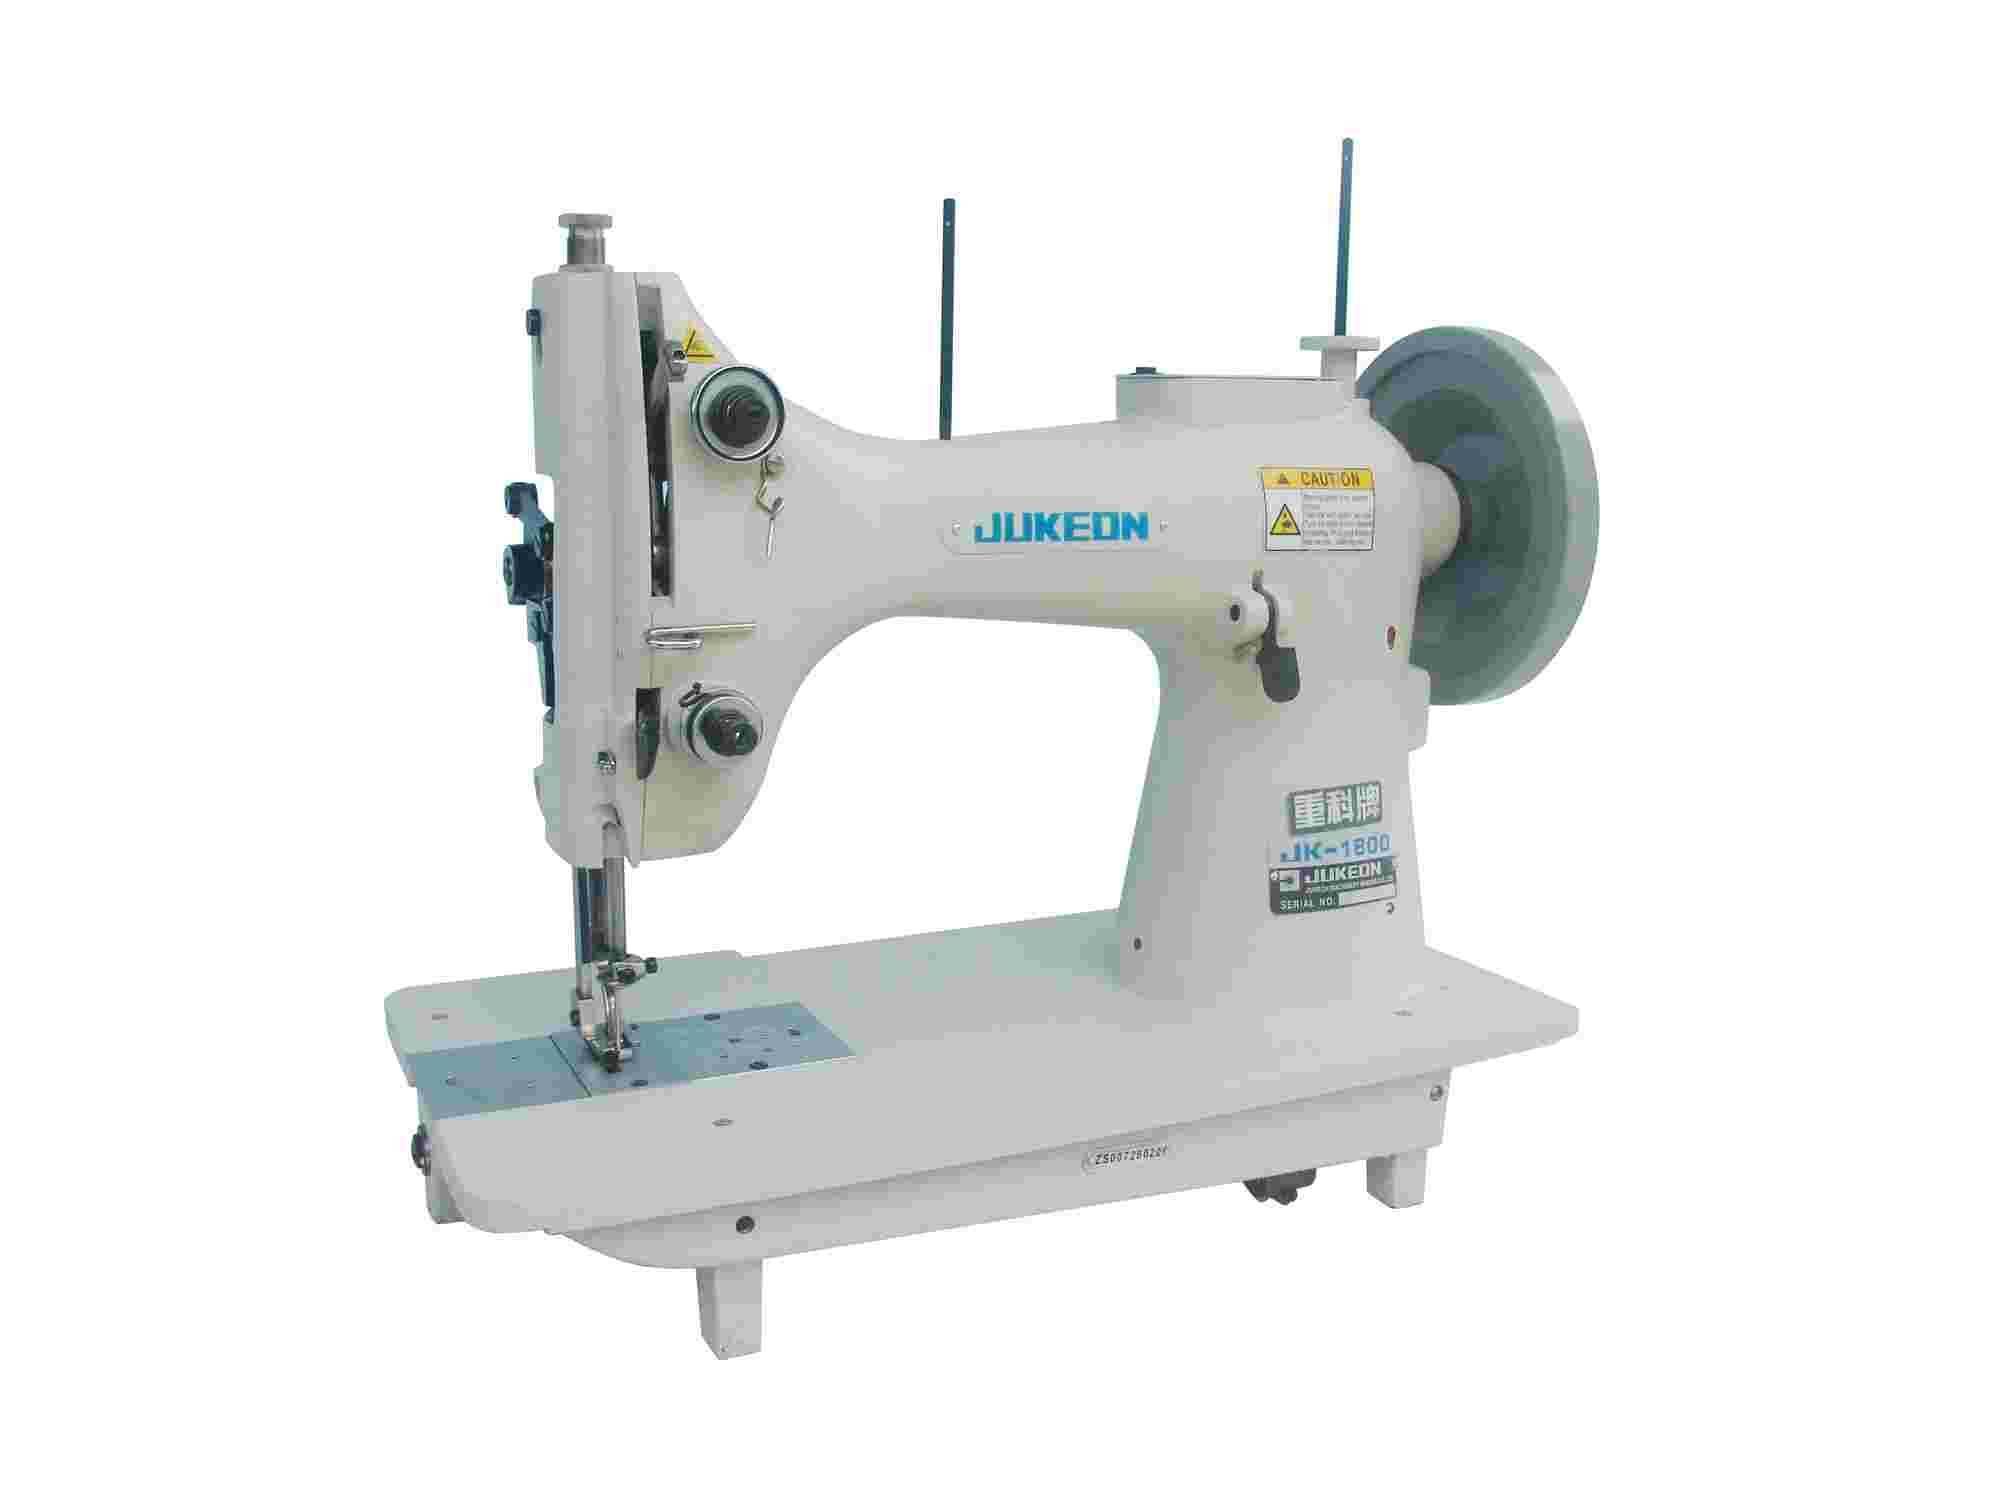 1802/1800 single needle, vertical rotary, large hook,flat-bed lockstitch sewing machine